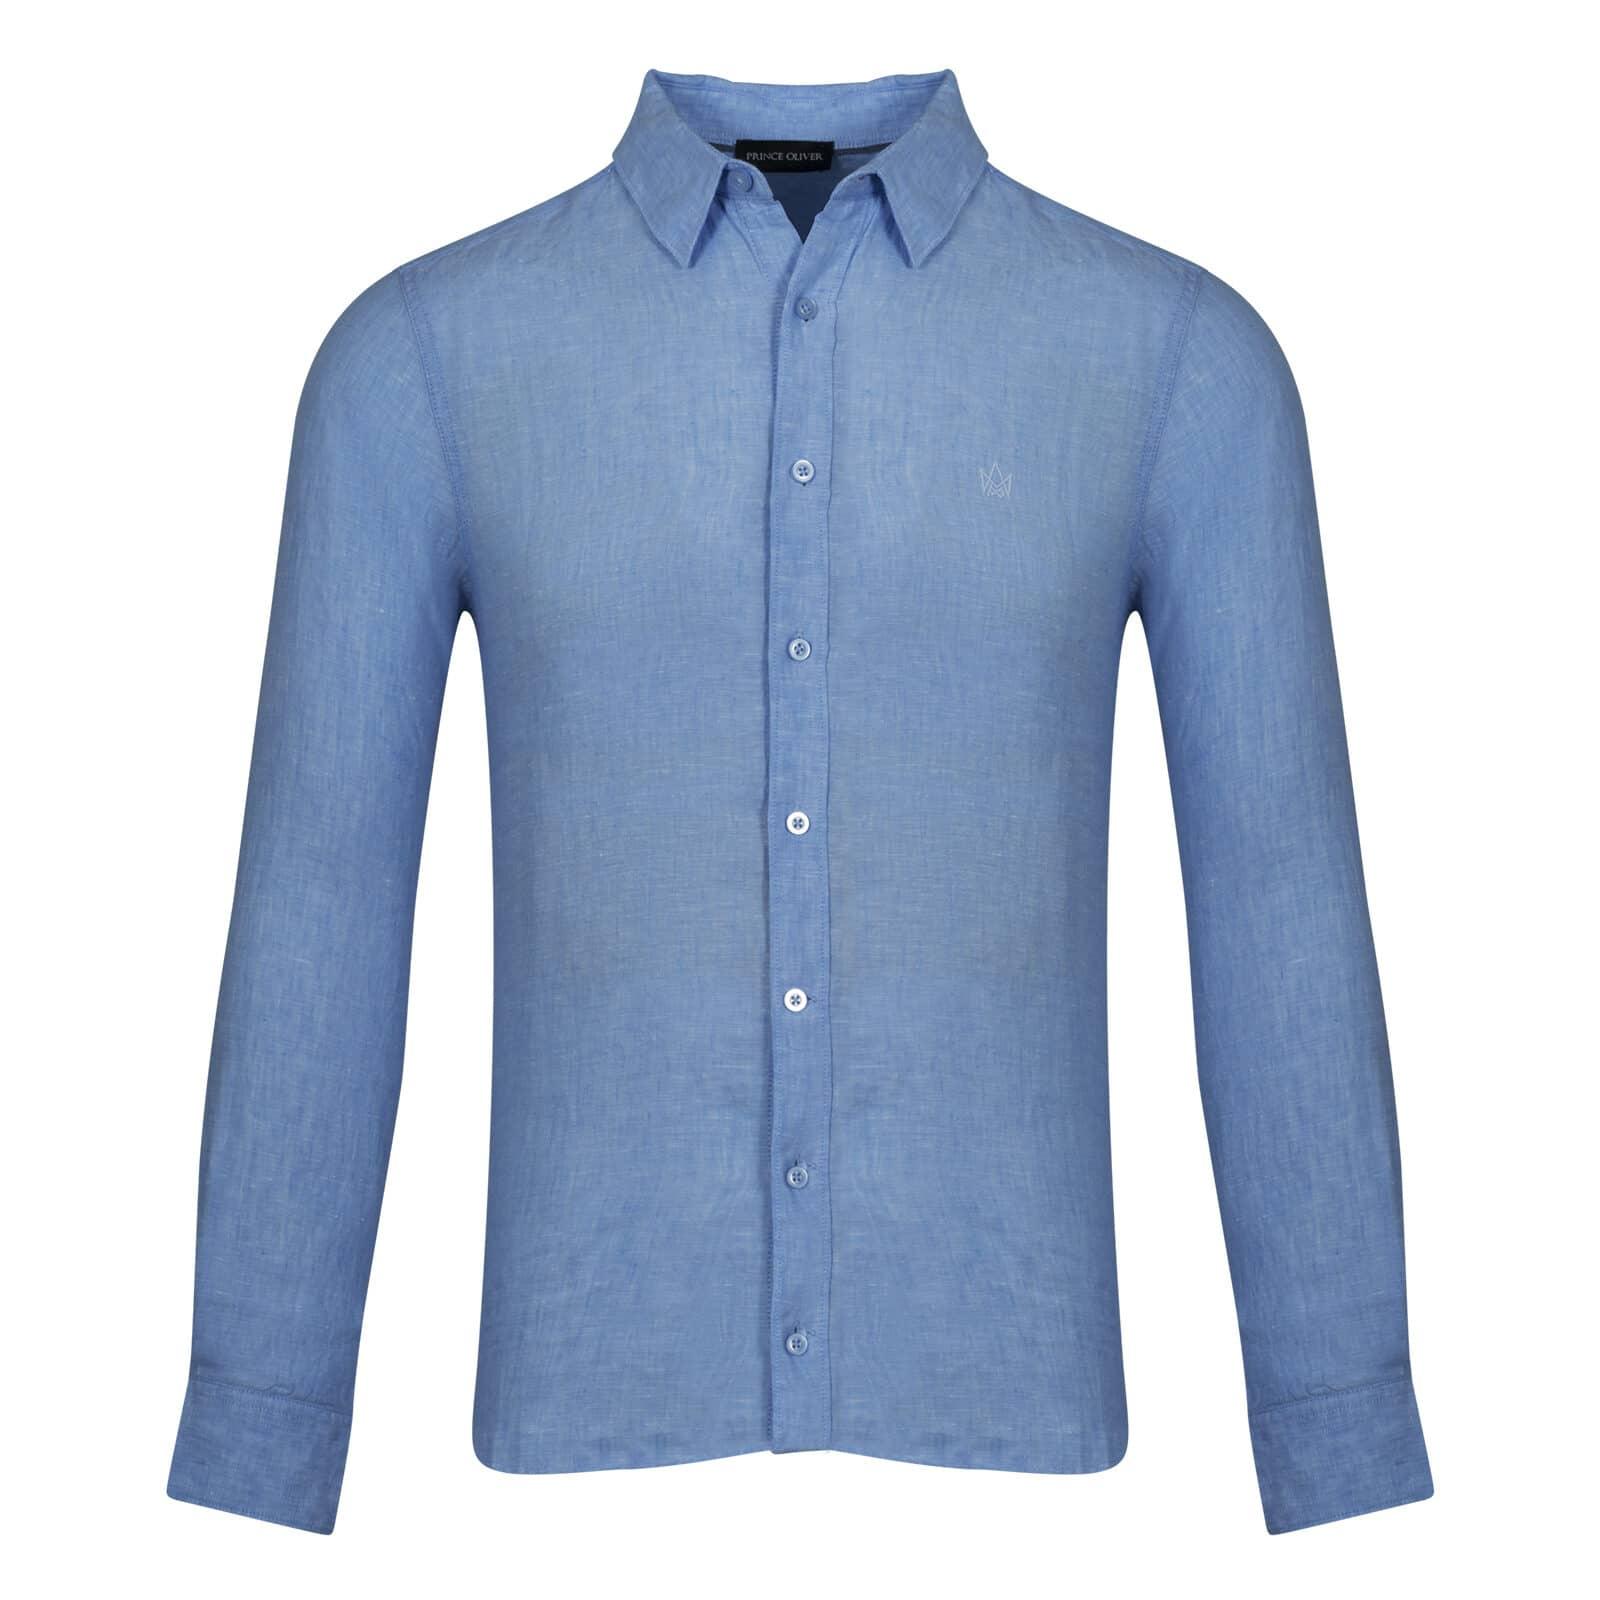 eec02ea177b Prince Oliver Πουκάμισο Μπλε 100% Linen - Collection S/S